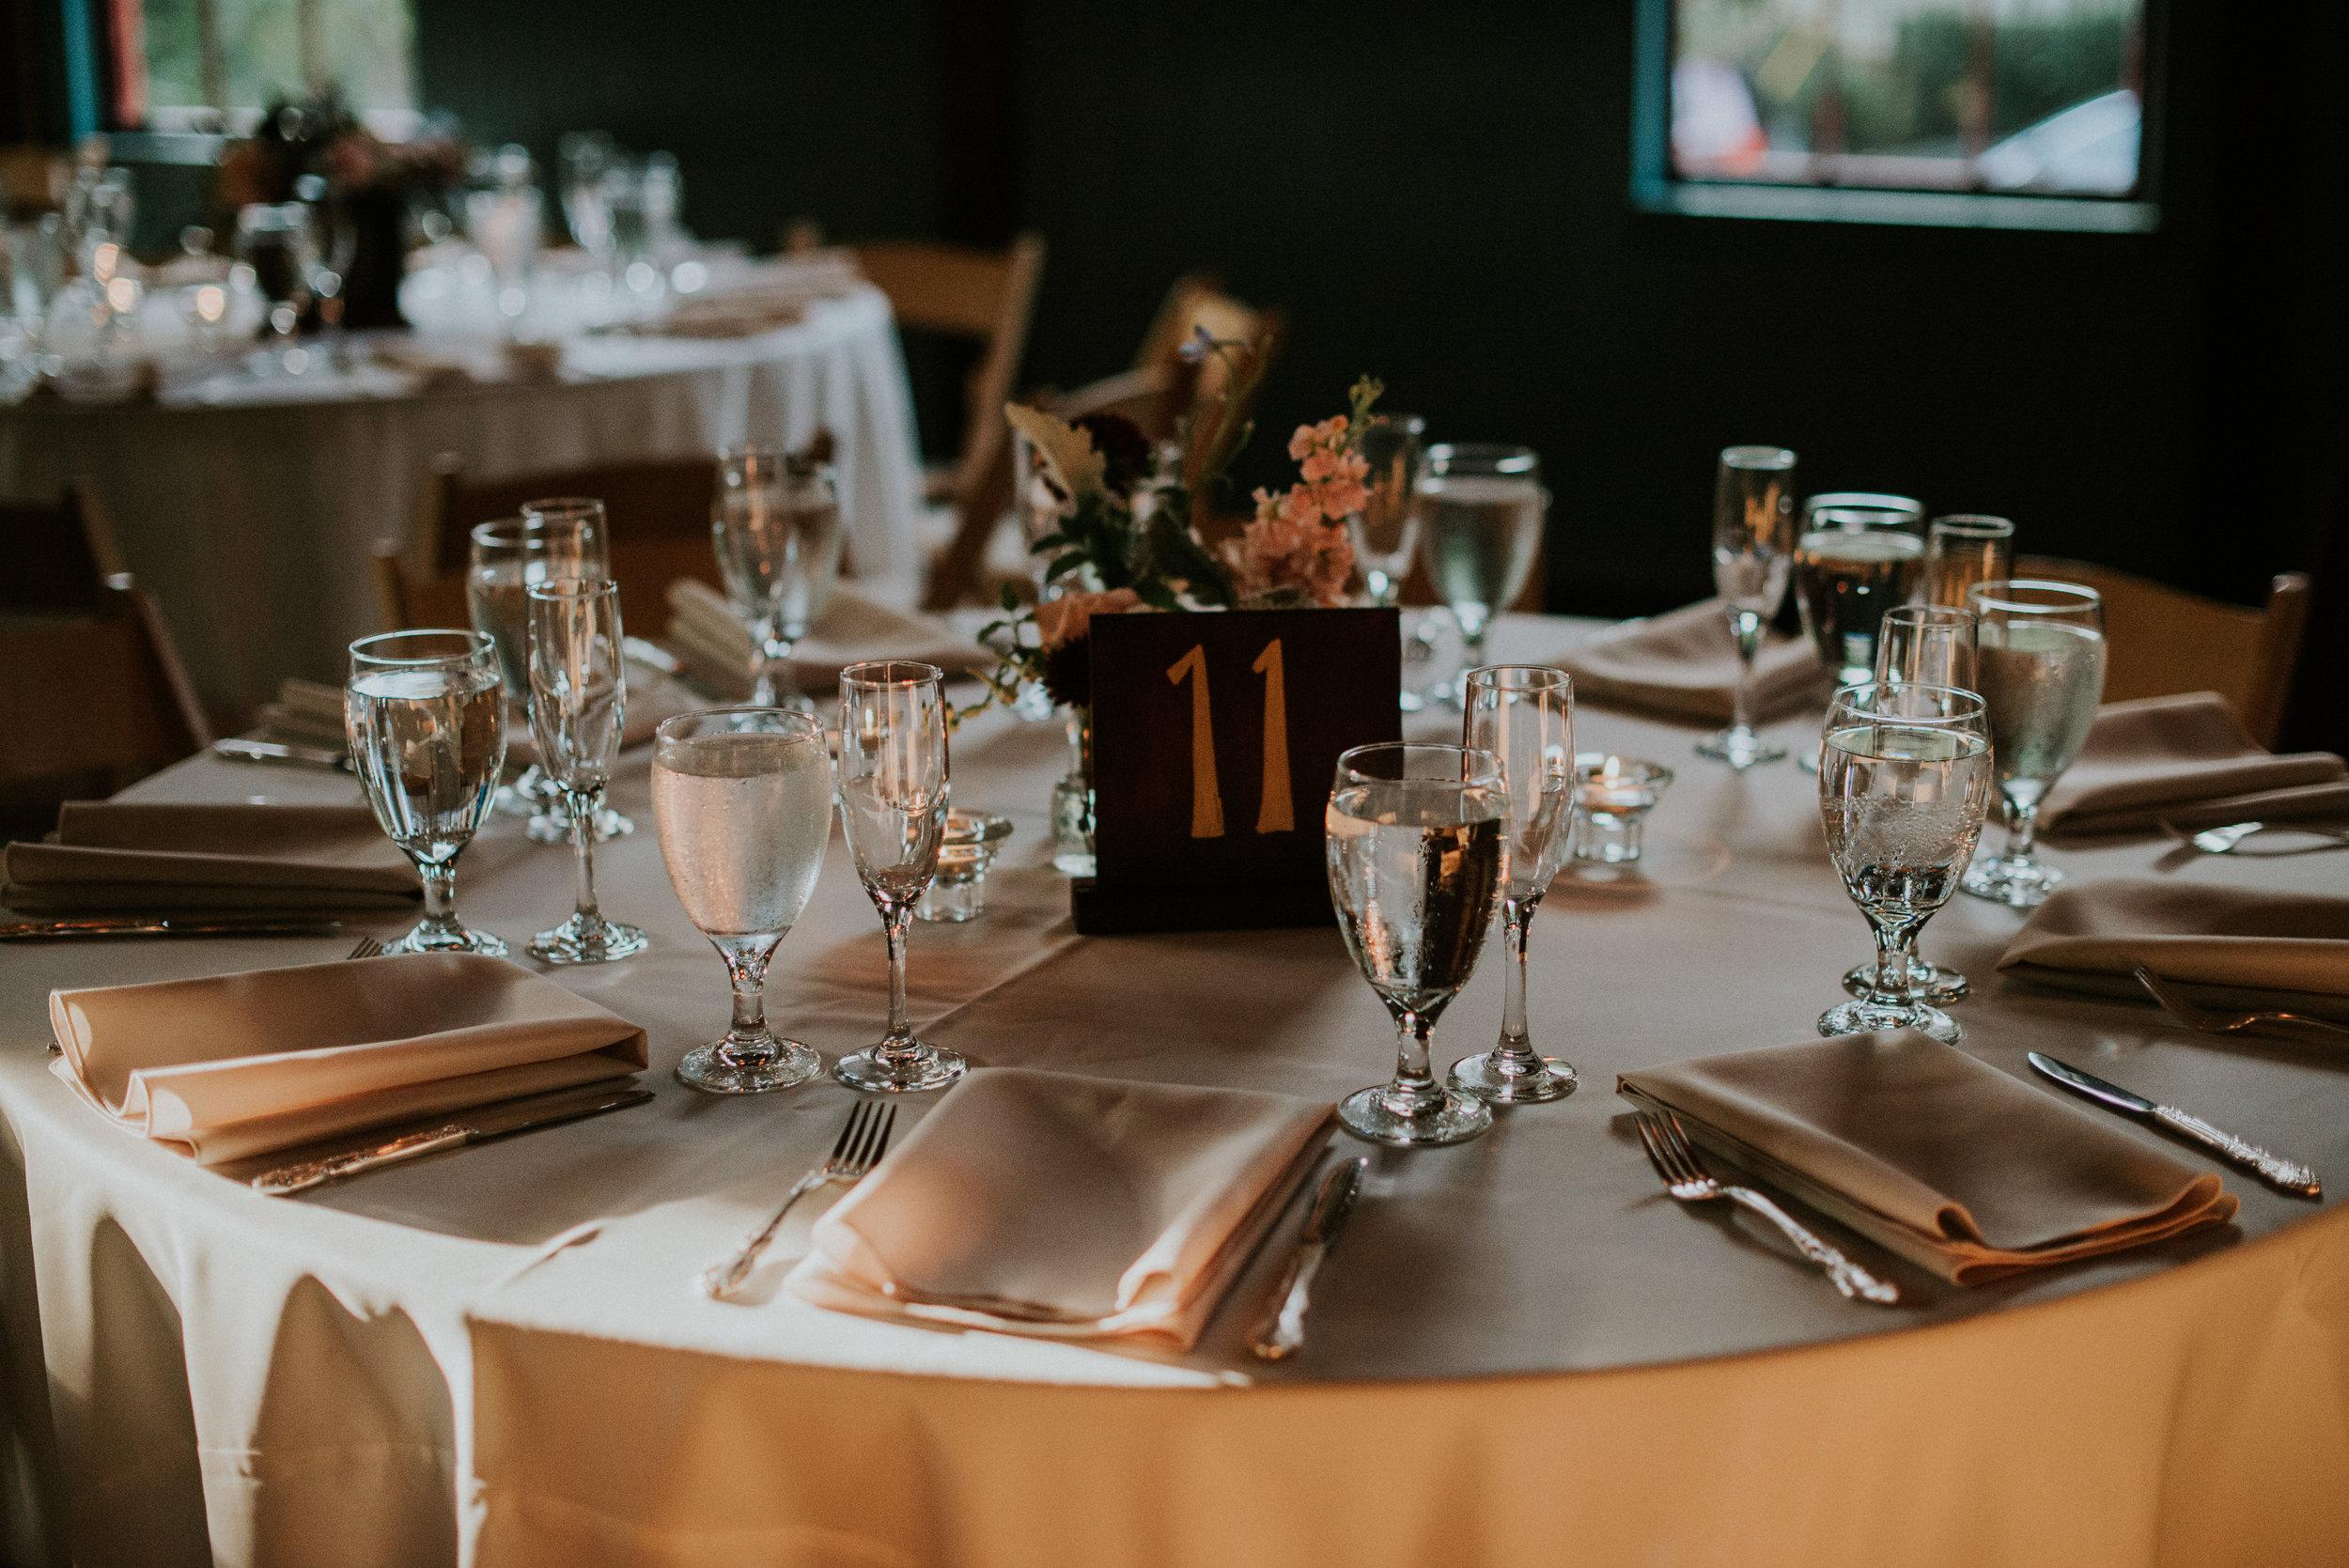 Table details of wedding reception at The Trolley Barn in Atlanta, GA